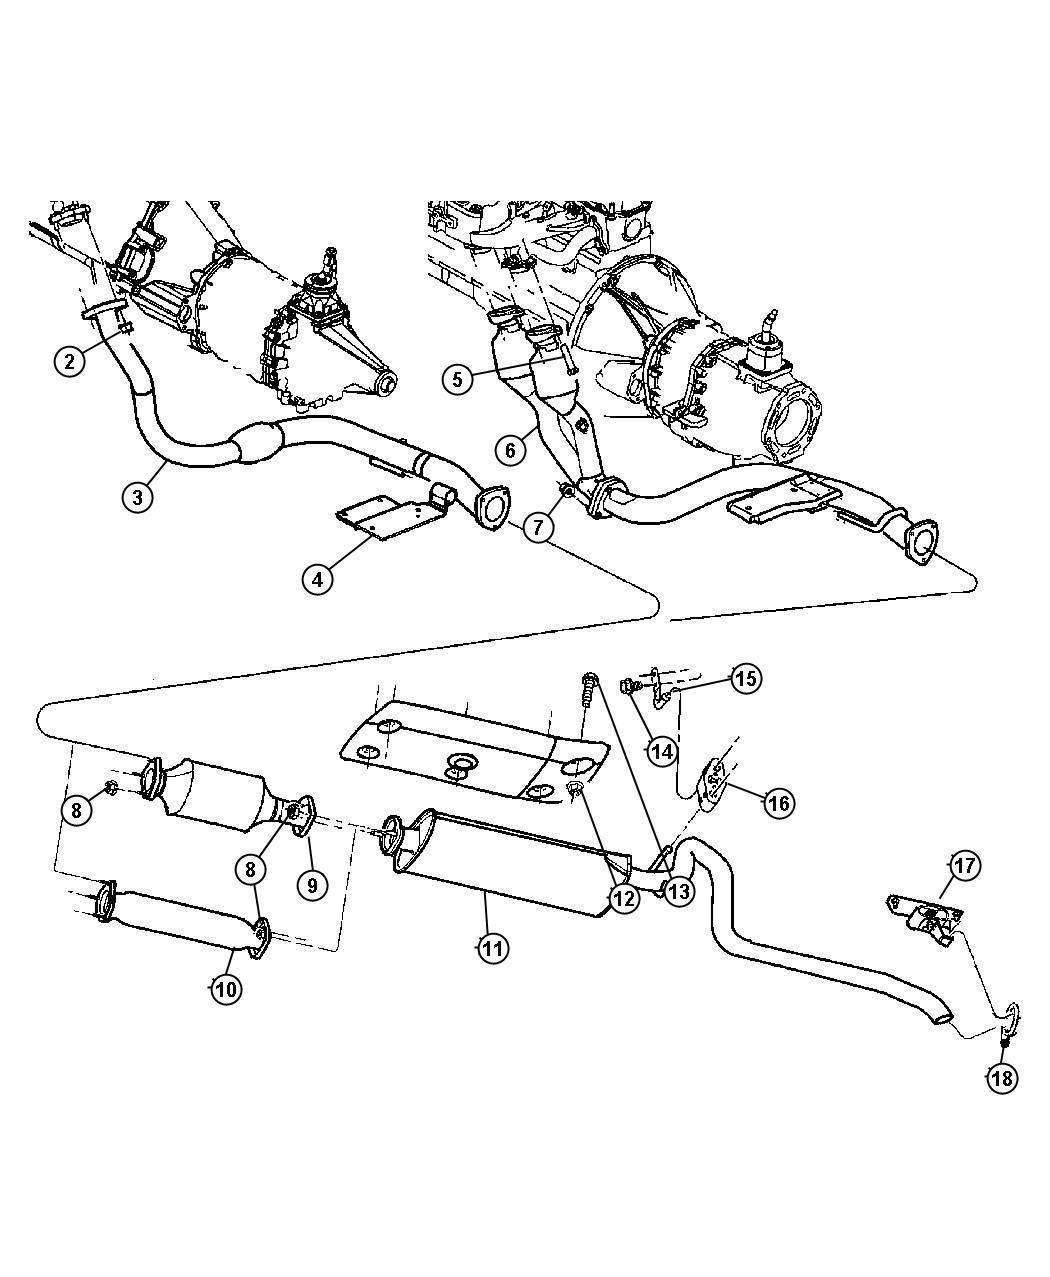 Jeep Cherokee 2 5l Engine Wiring Diagram